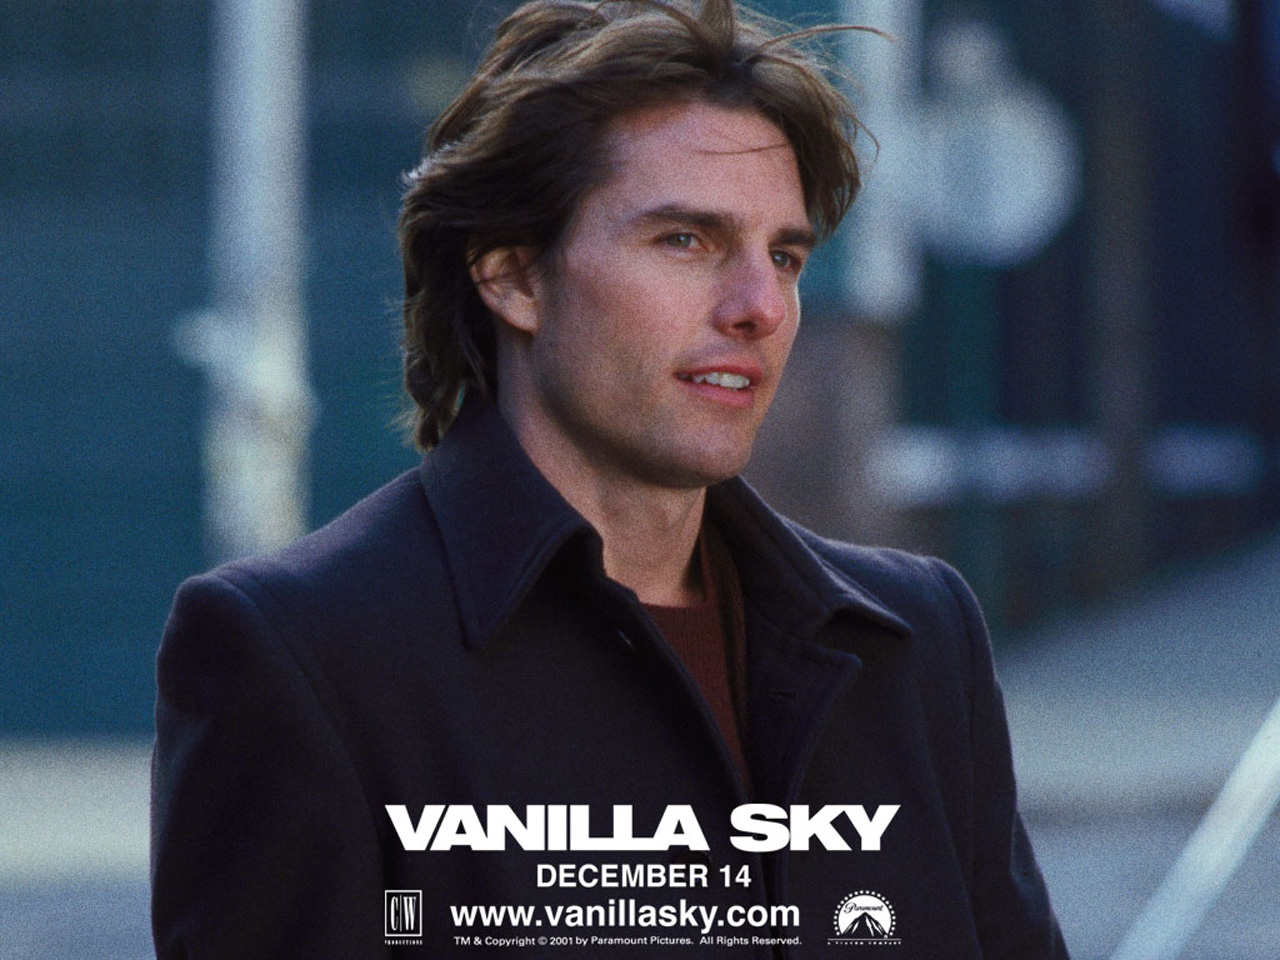 TOm Cruise   Tom Cruise Wallpaper 24203284 1280x960